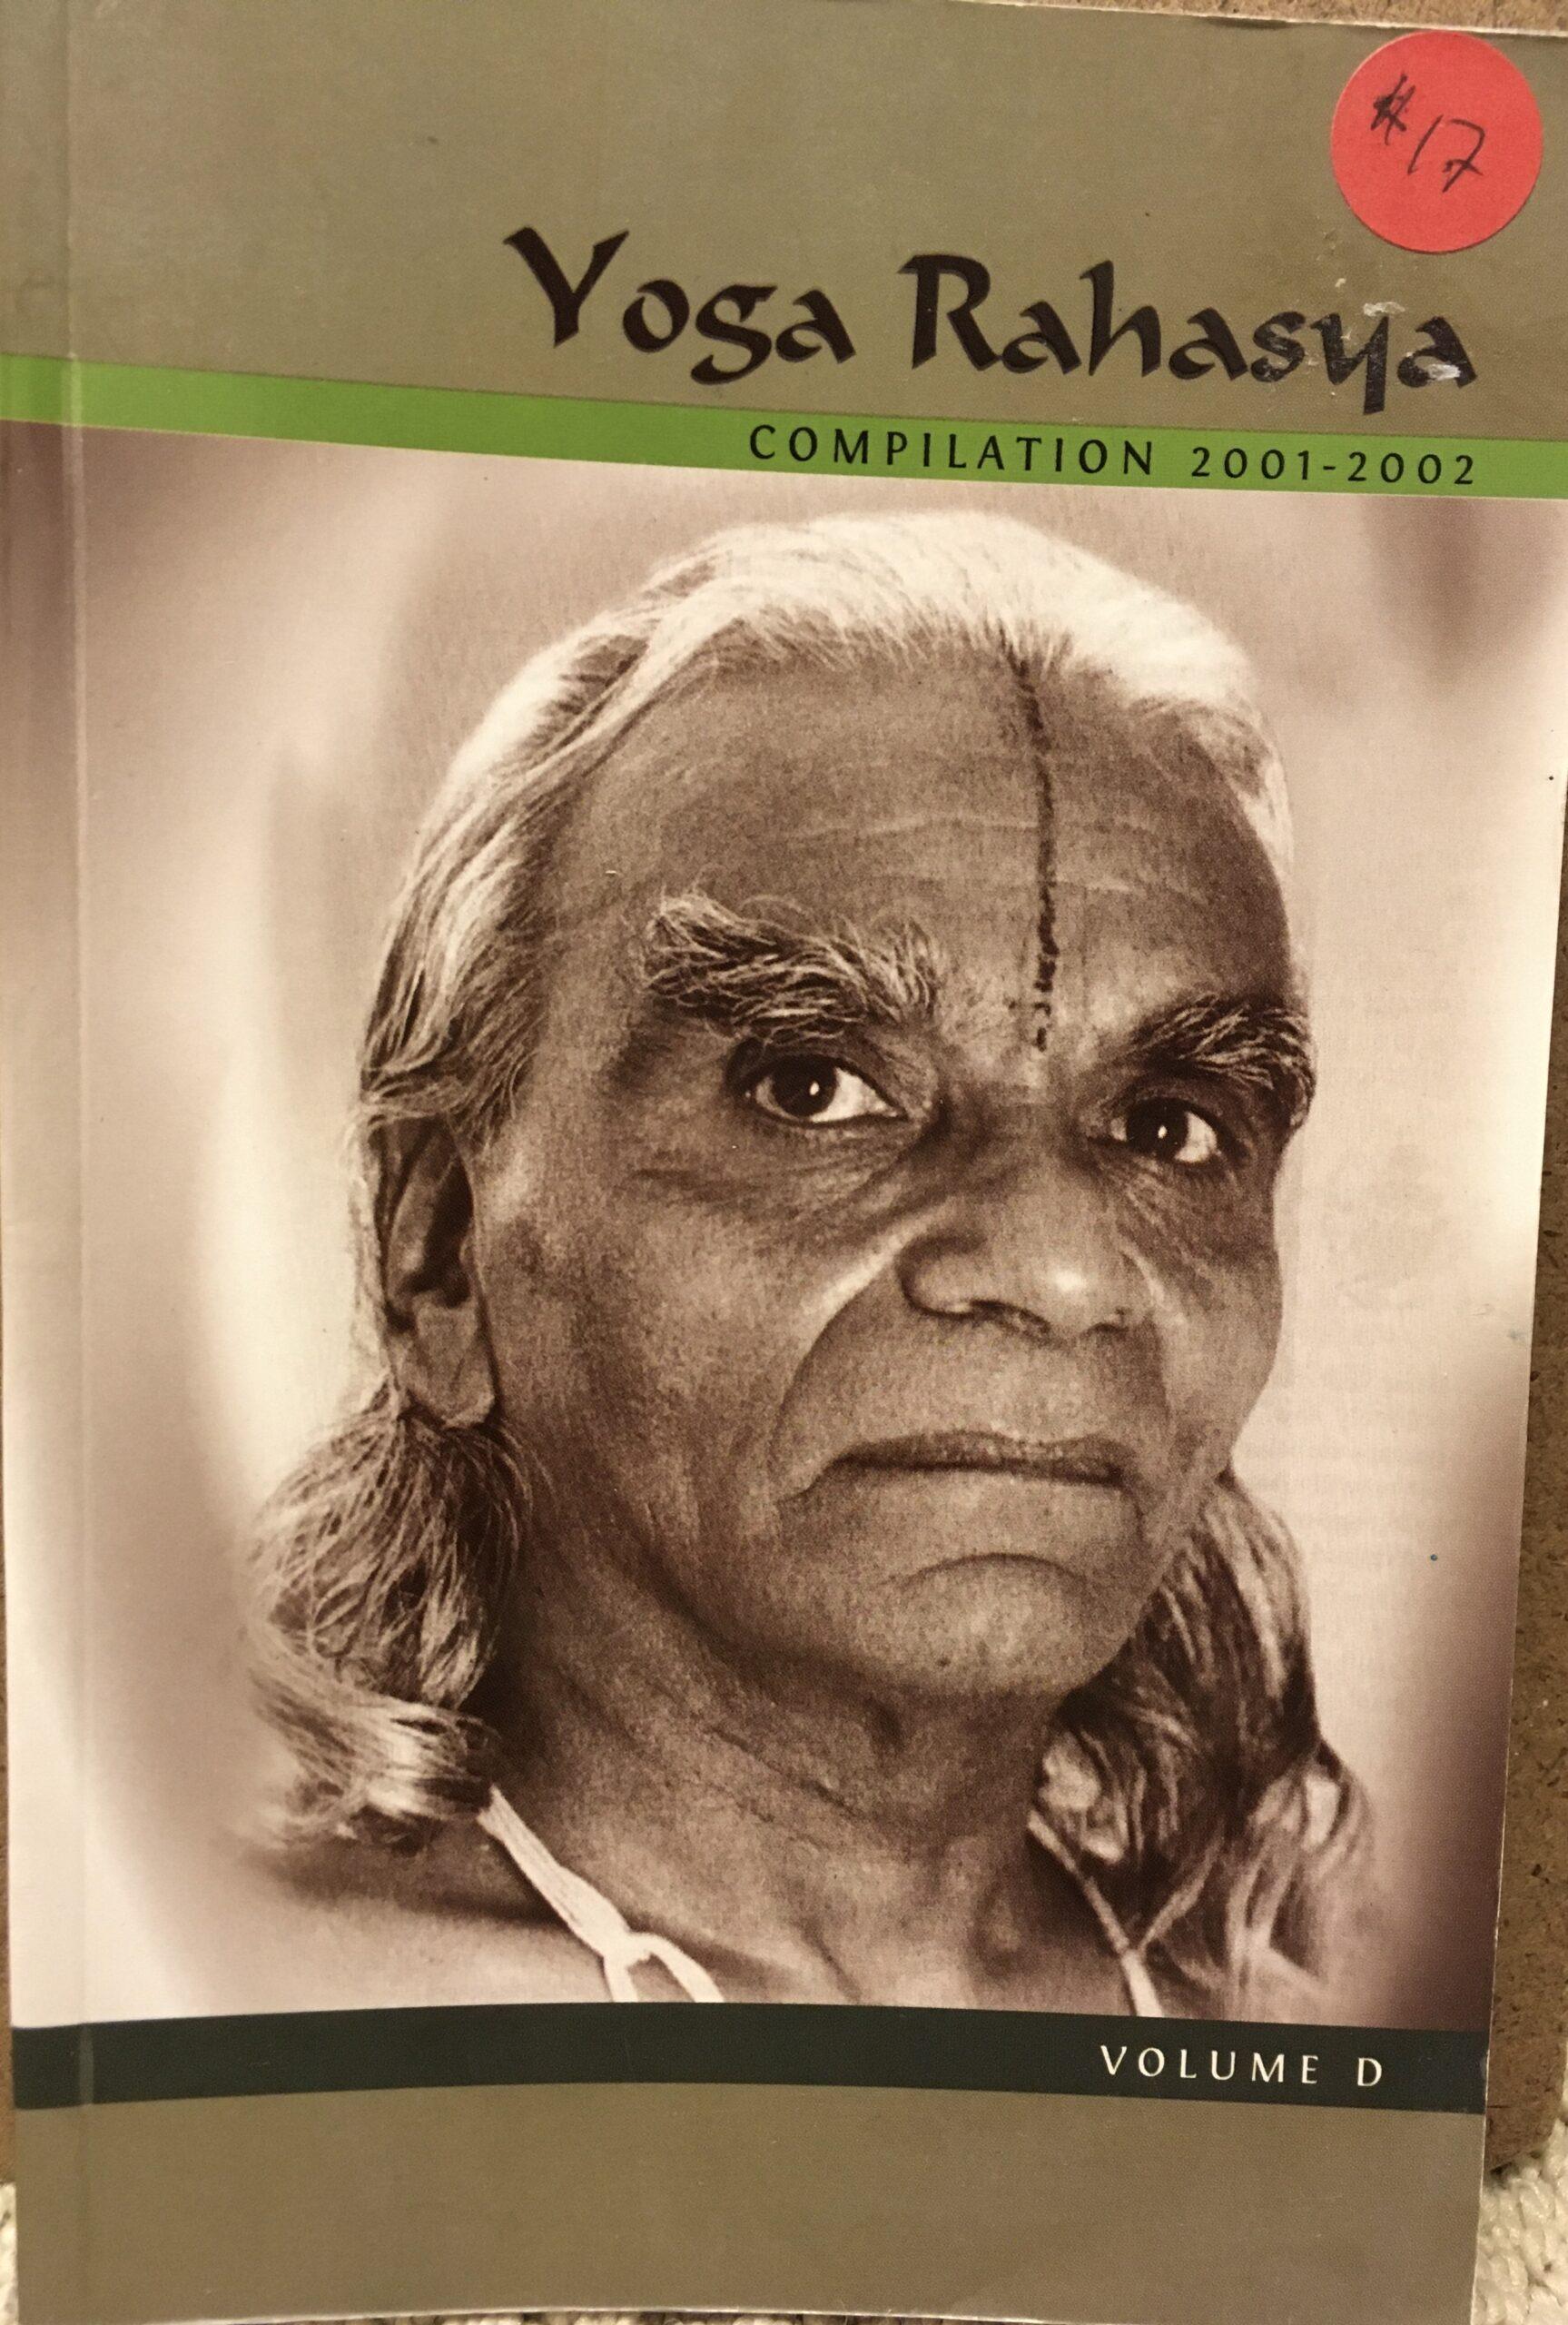 Yoga Rahasya D-Compilation 2001-2002